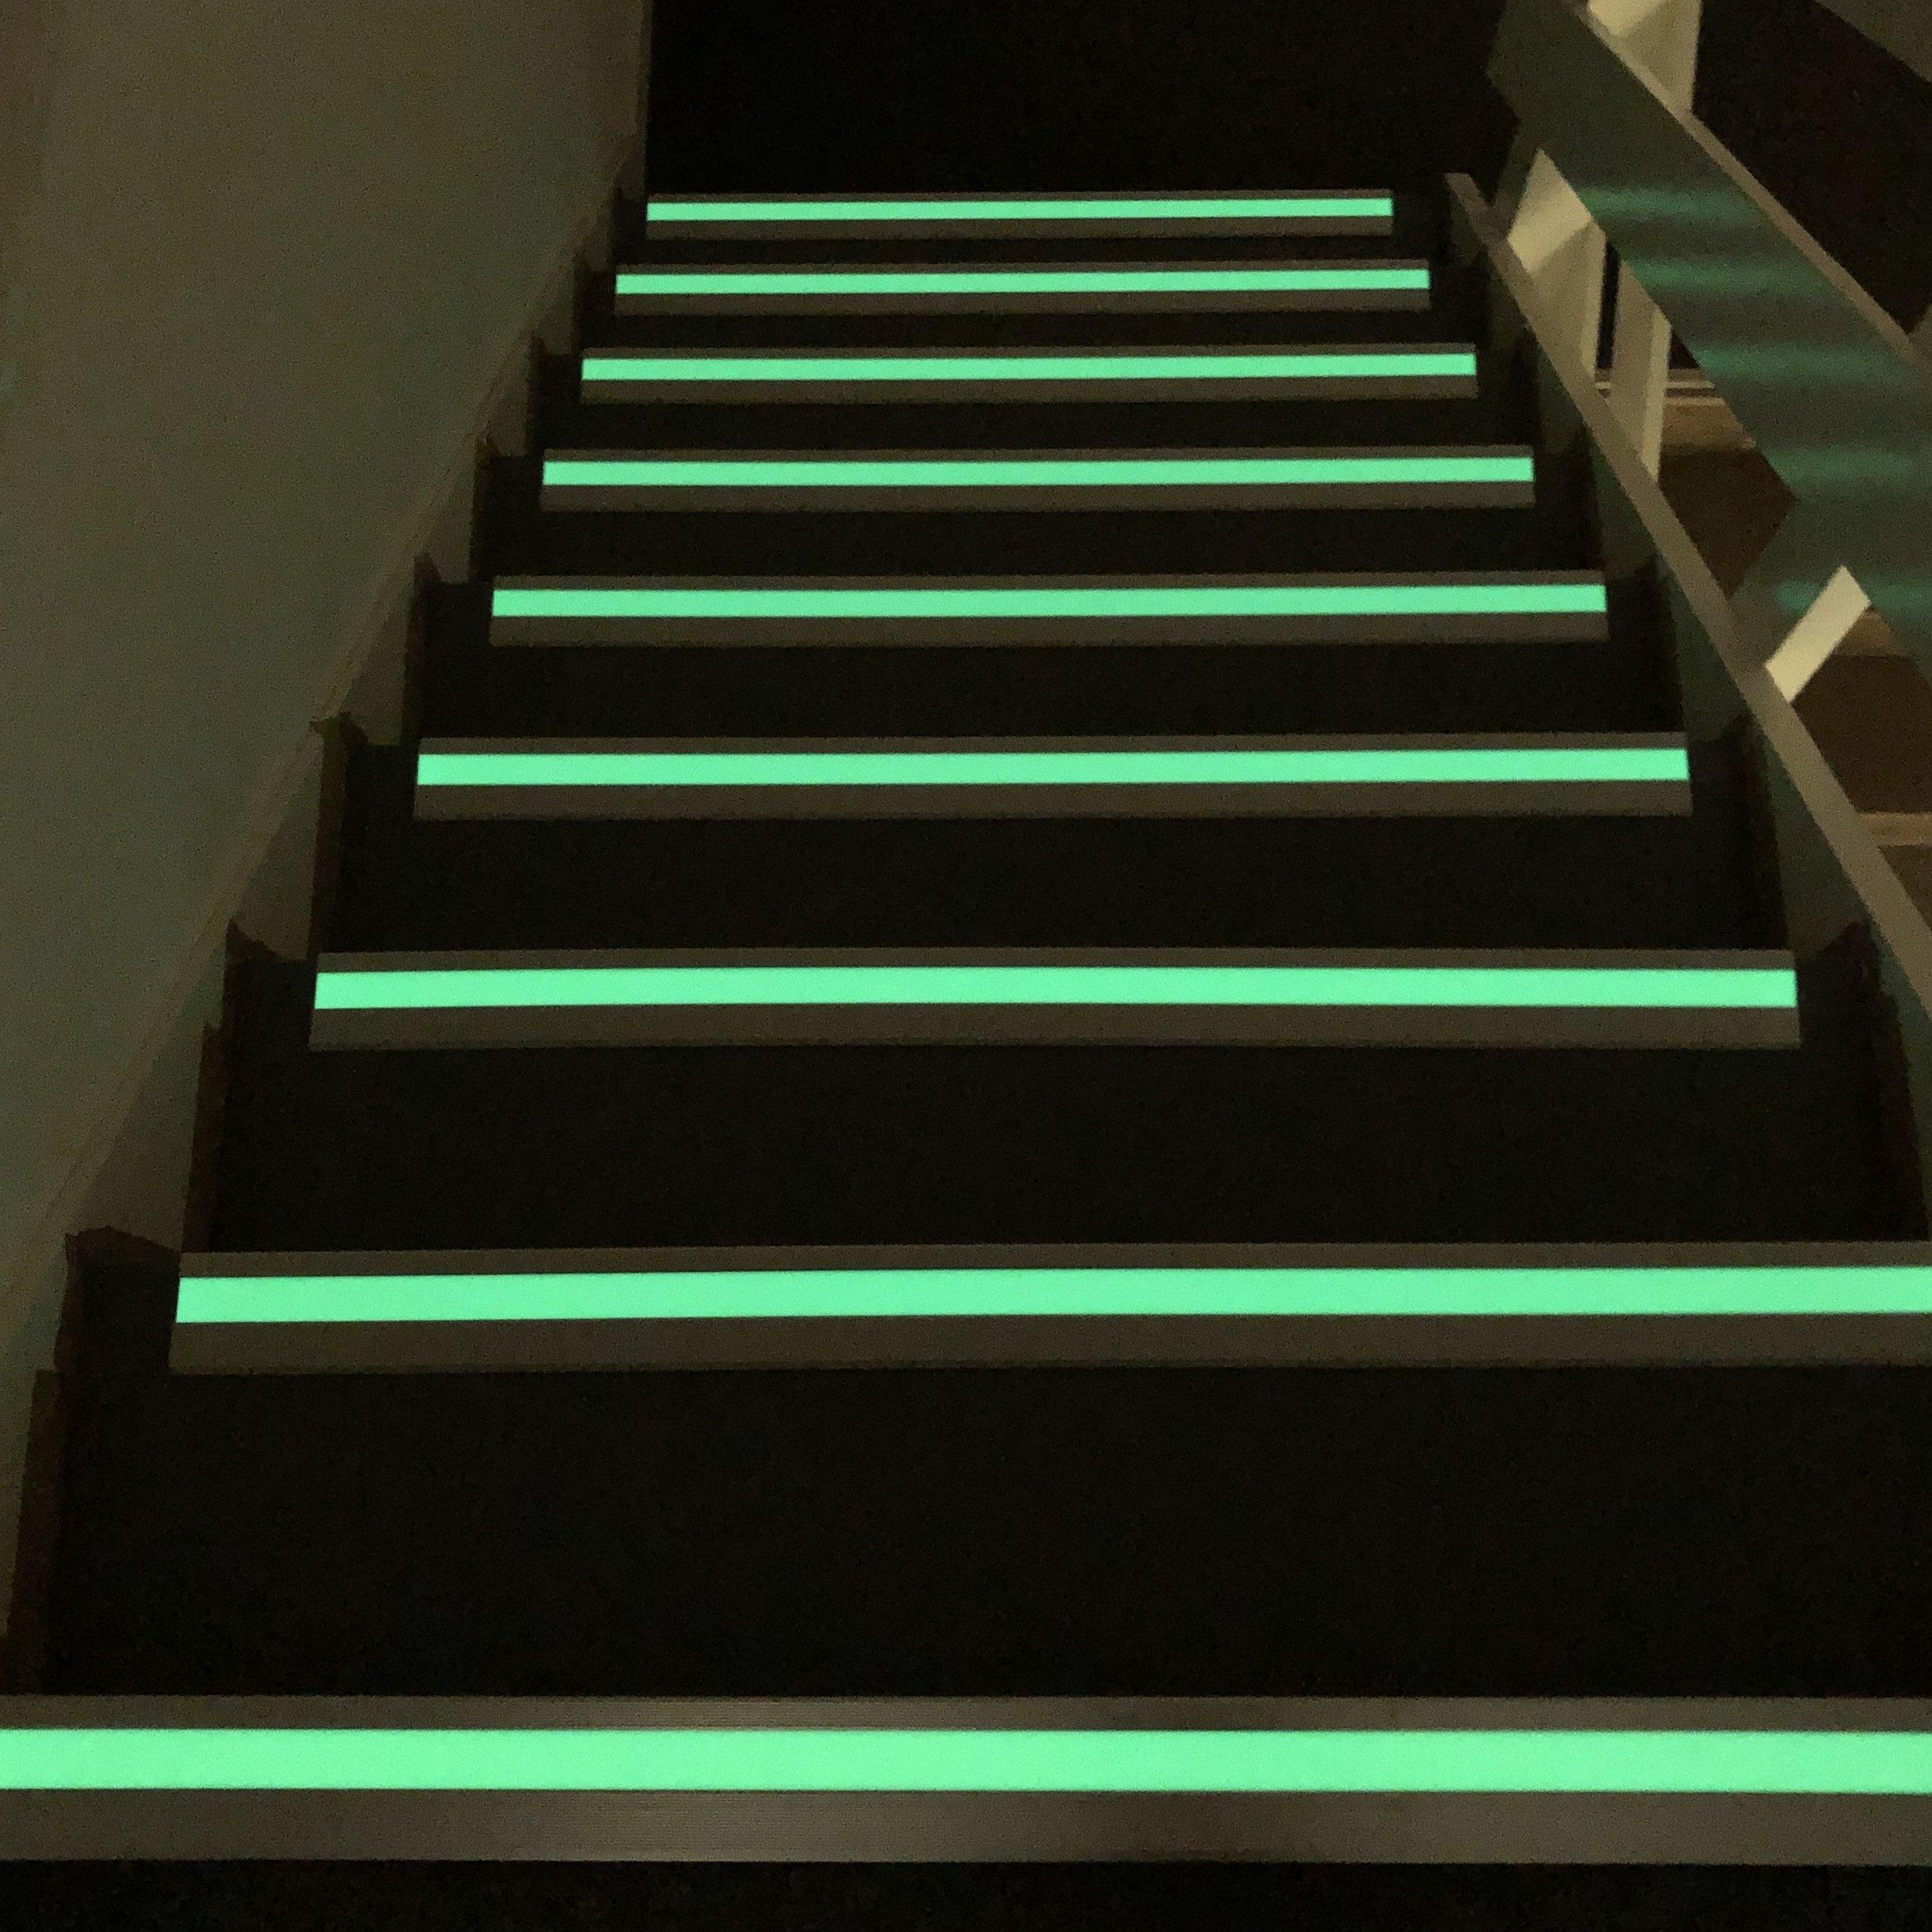 photoluminescent-stair-nosing.jpg